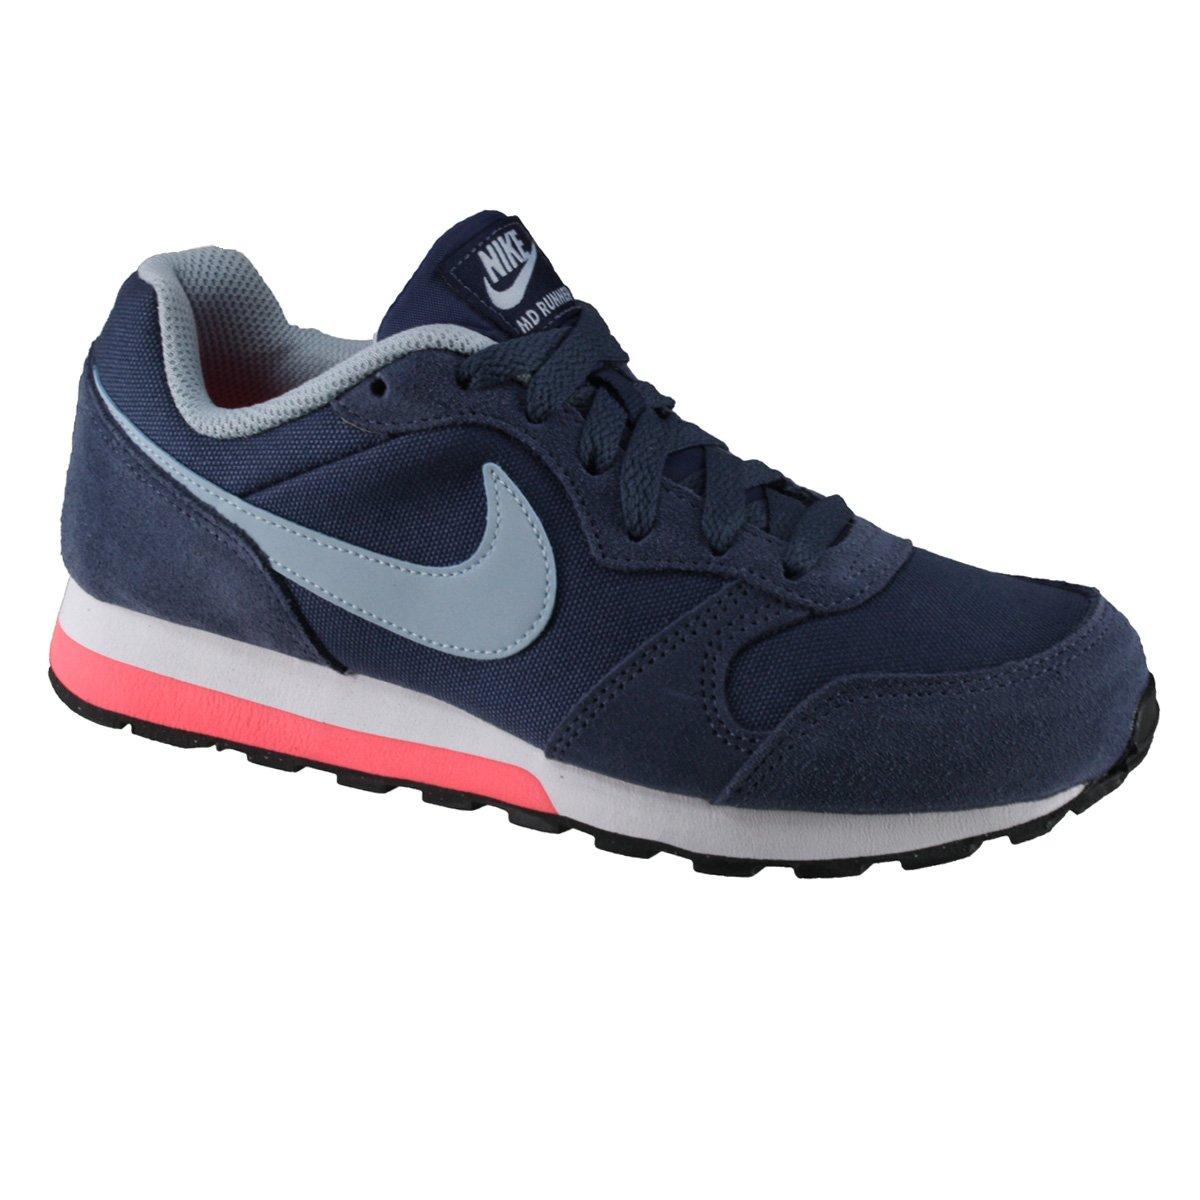 Tênis Nike MD Runner 2 (GS) Infantil 807319-405 - Azul Branco Coral ... b06ca5689ffb7